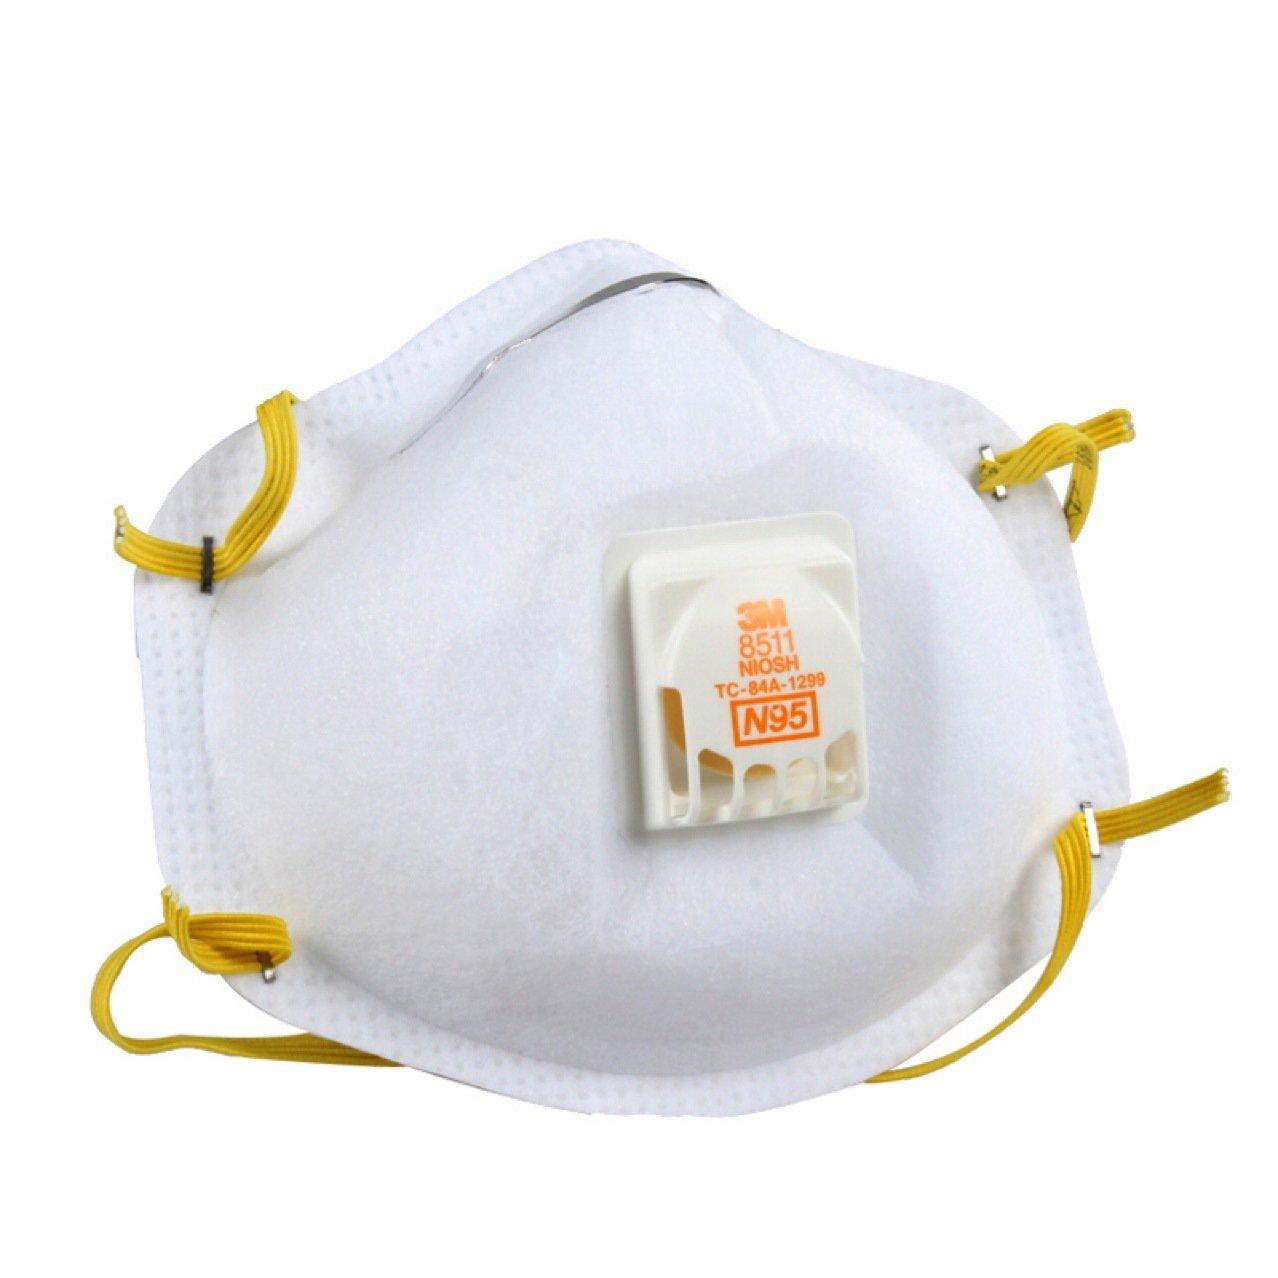 3mหน้ากาก kn95วาล์วหายใจ8511อุตสาหกรรมฝุ่นอย่างเป็นทางการป้องกันHoneywell8210หมอกและหมอกควันN95